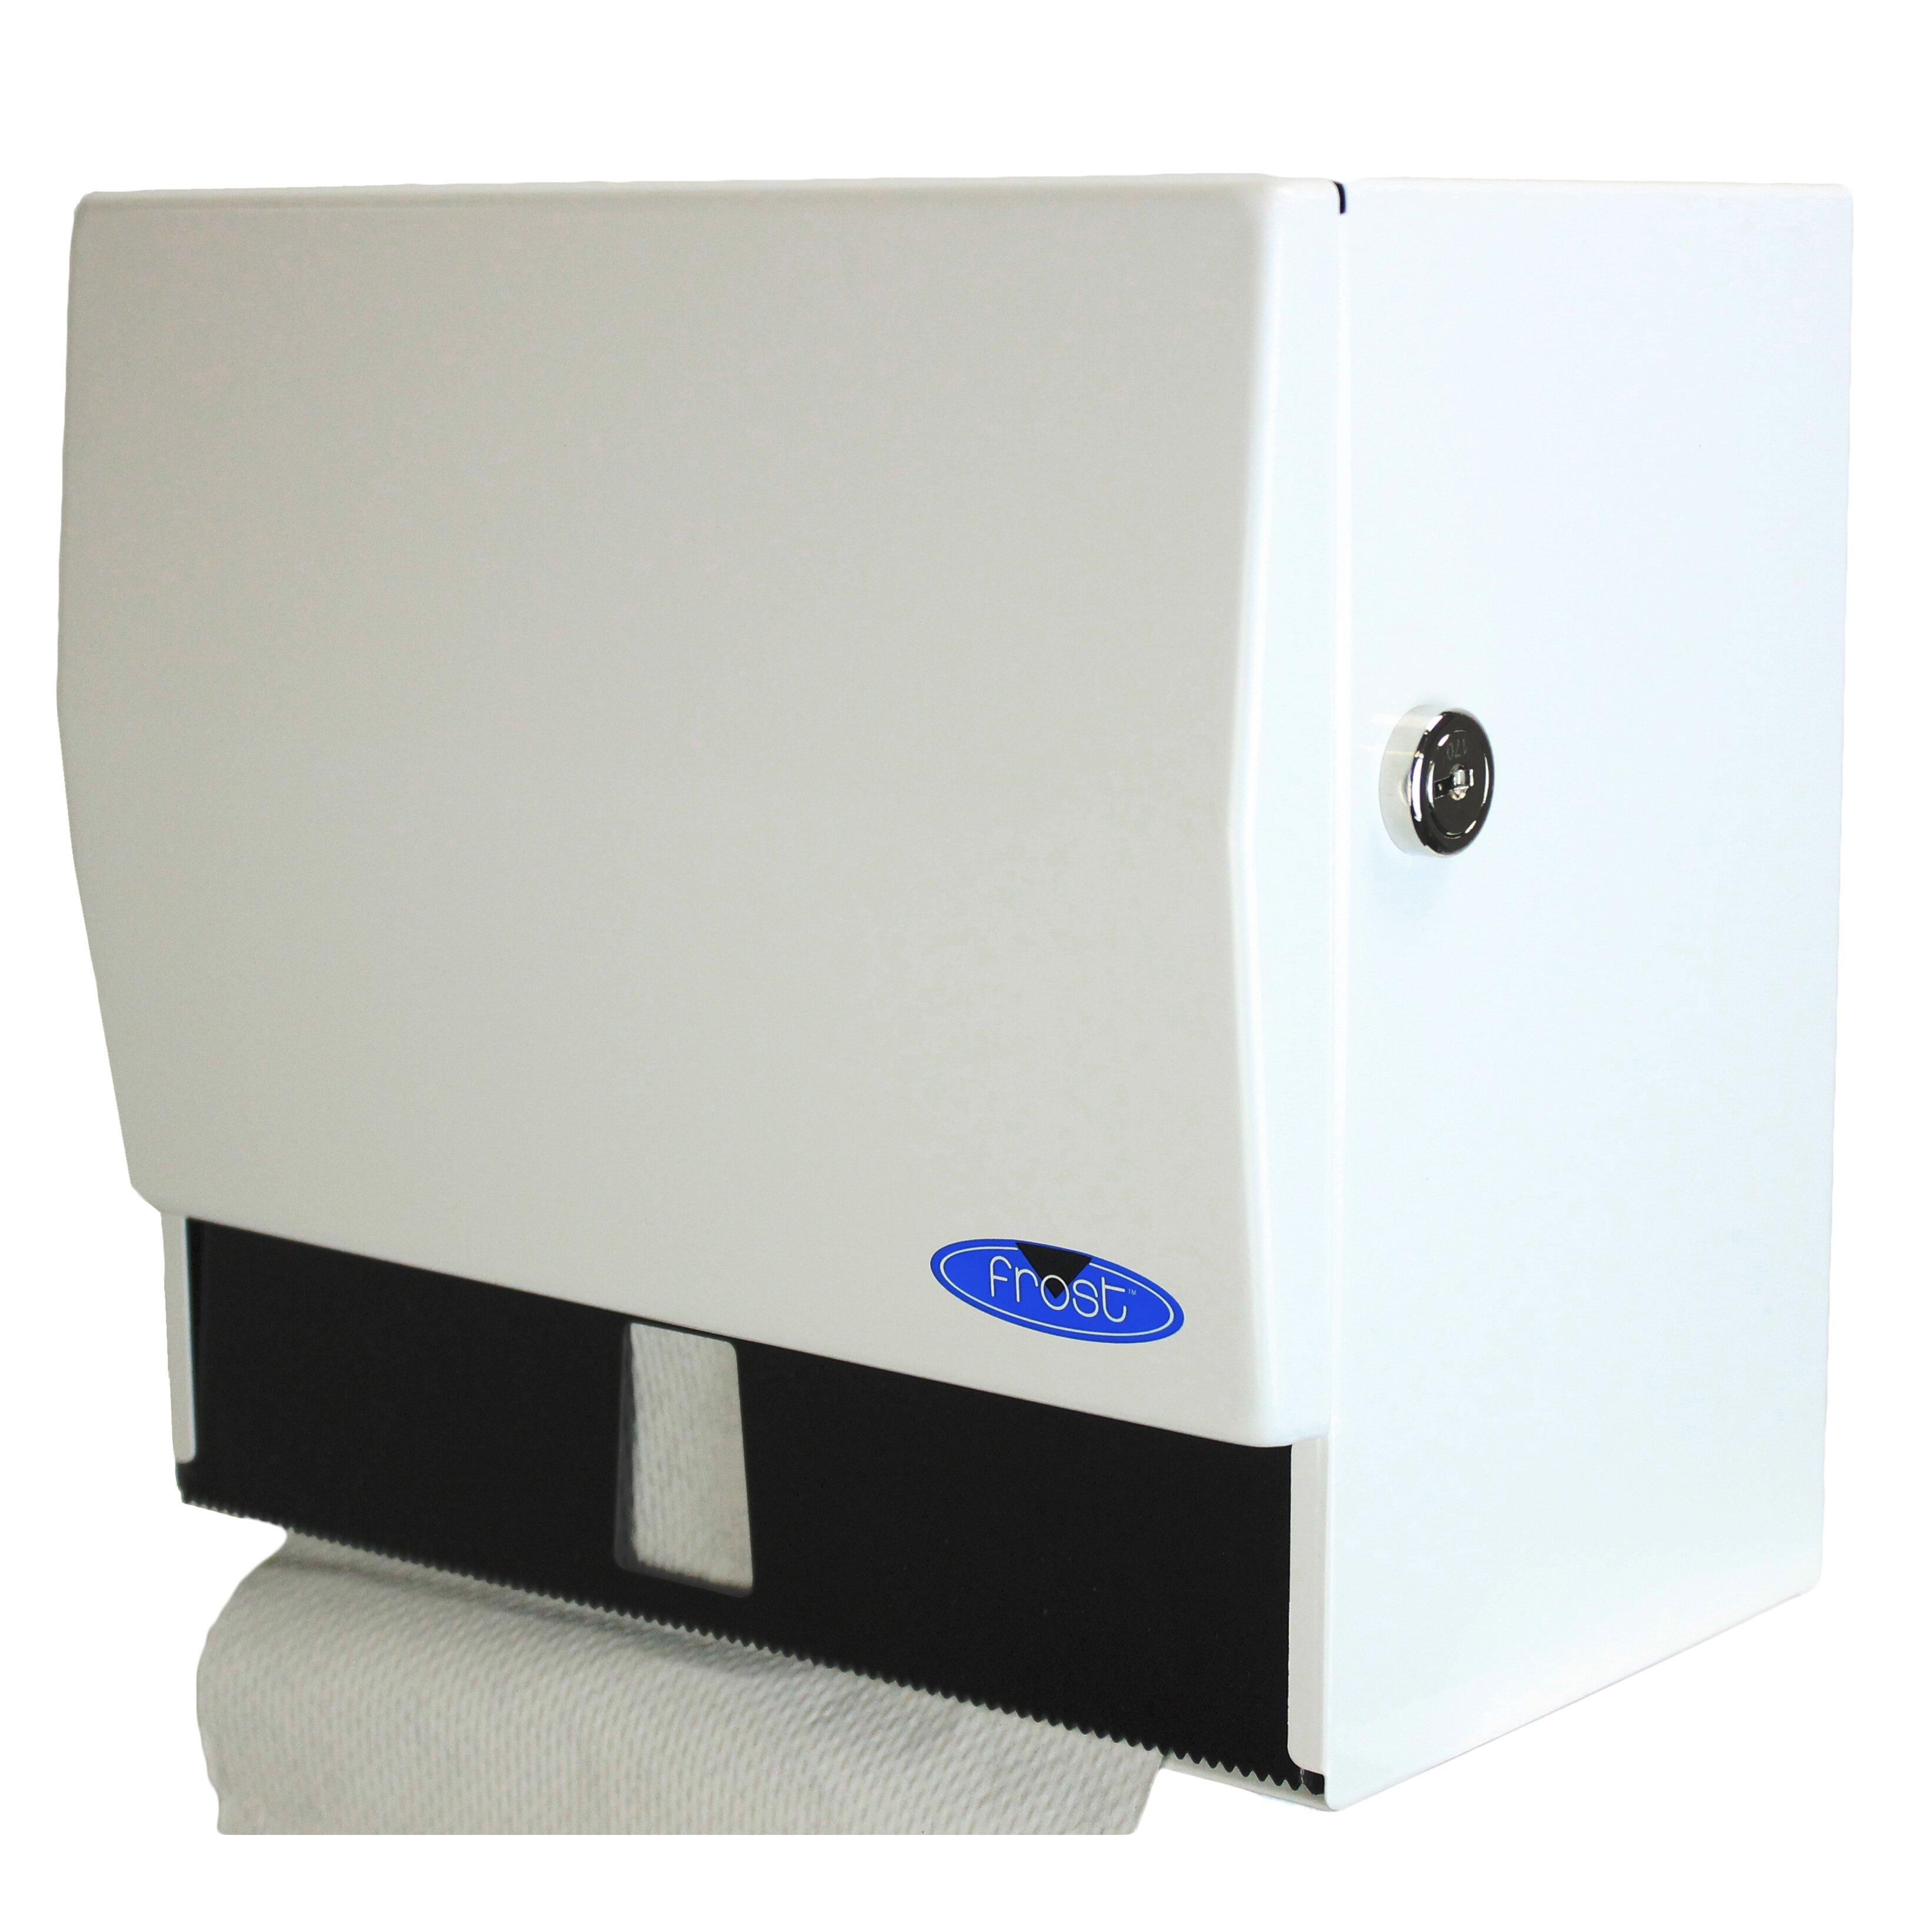 Frost Universal Paper Towel Dispenser With Lock Wayfair